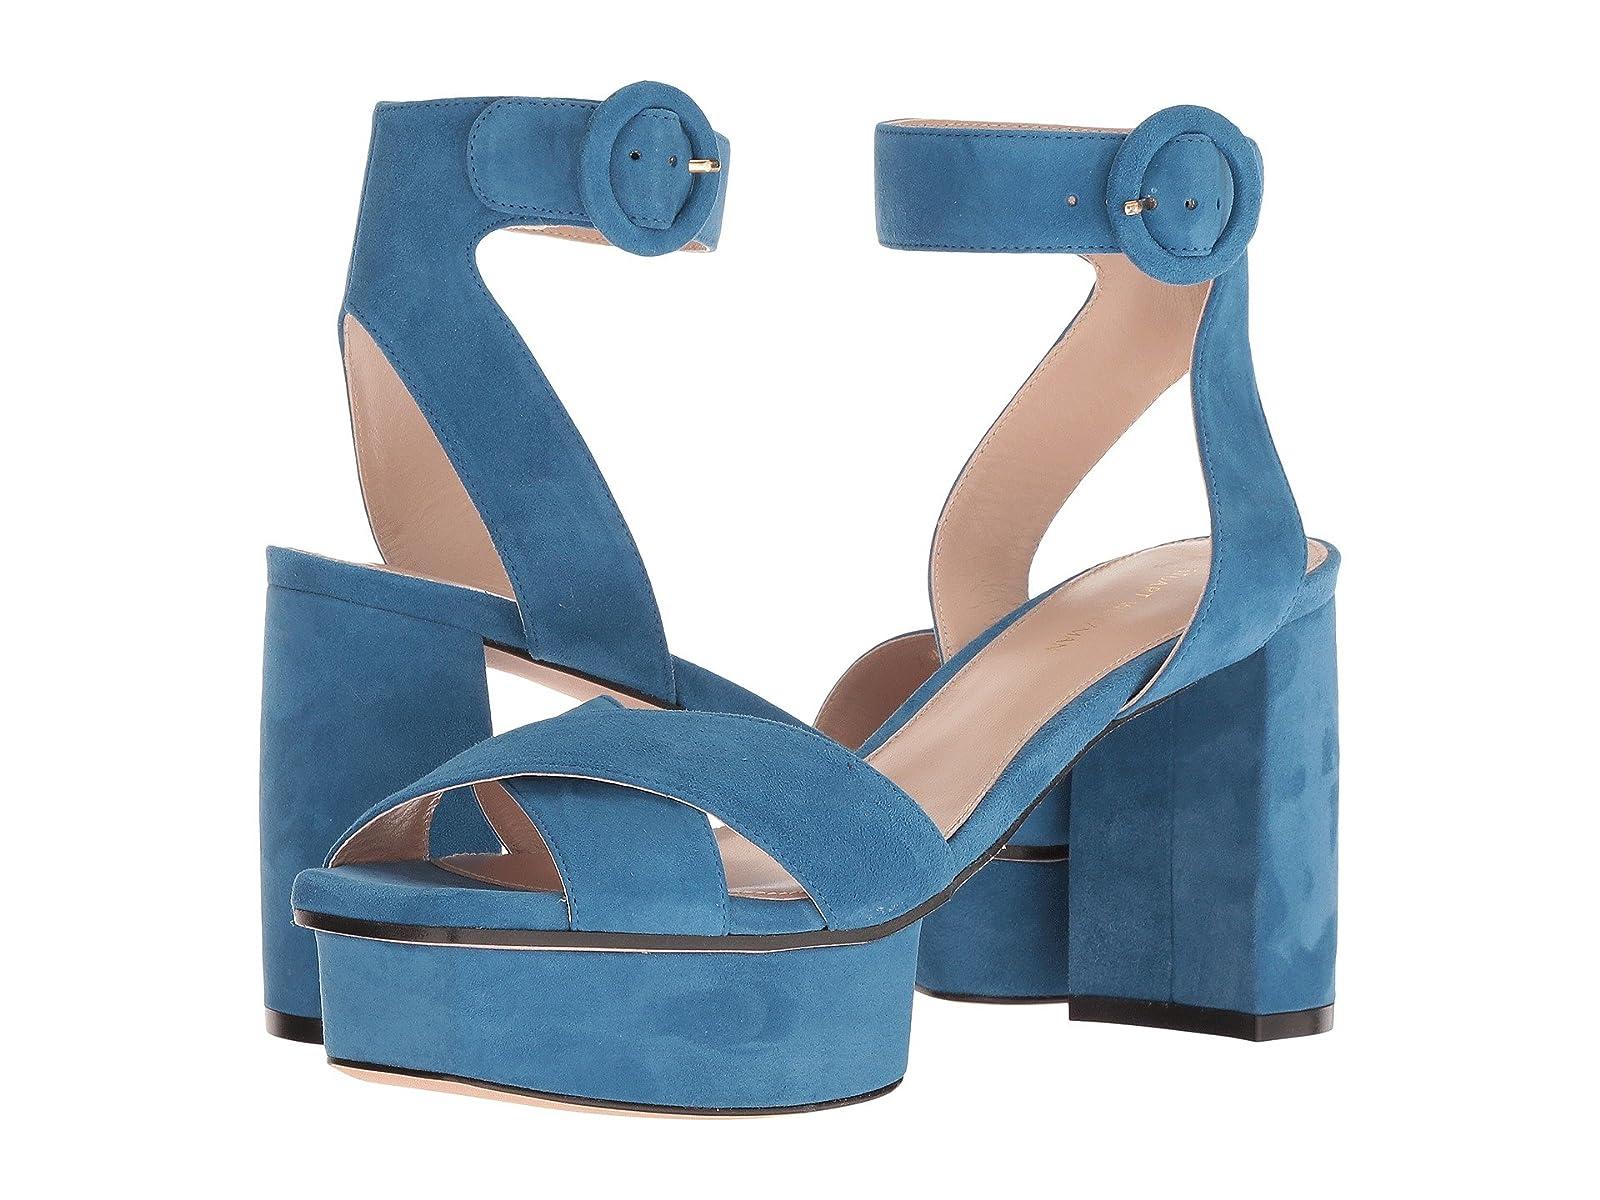 Stuart Weitzman CarminaCheap and distinctive eye-catching shoes